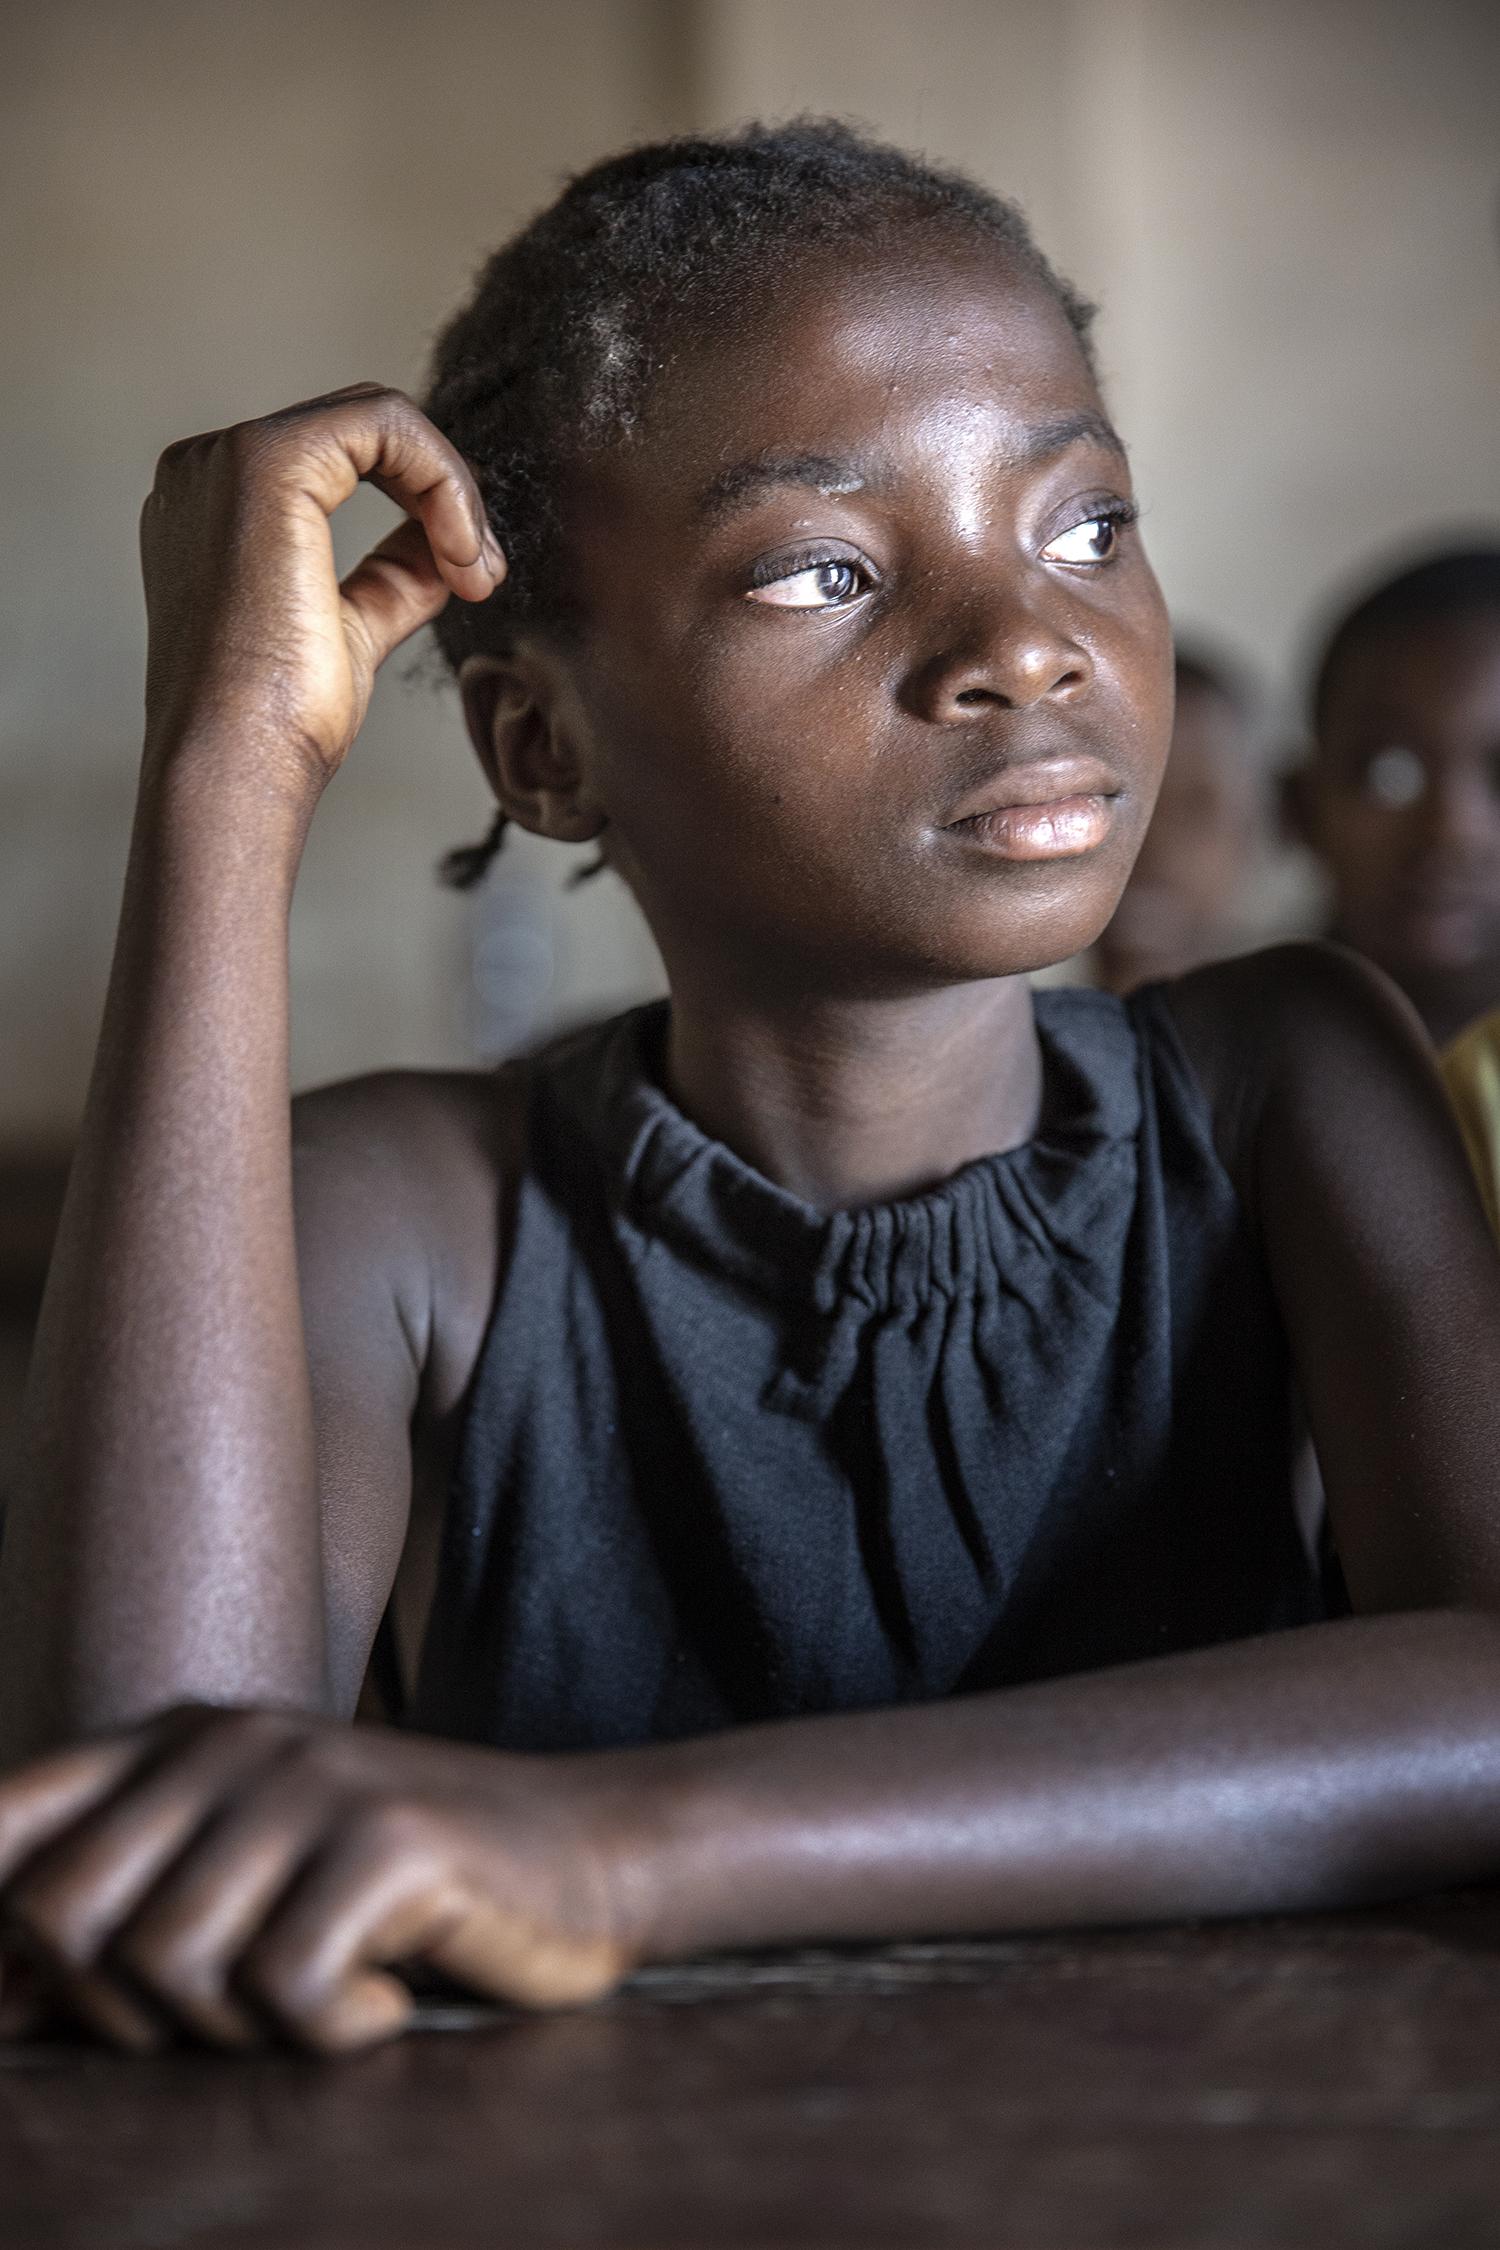 20180704_WCH_DRA_Dutch_Relief_Alliance_DRC_Congo_Lulimba_Julia_Jeppe_Schilder_03.jpg